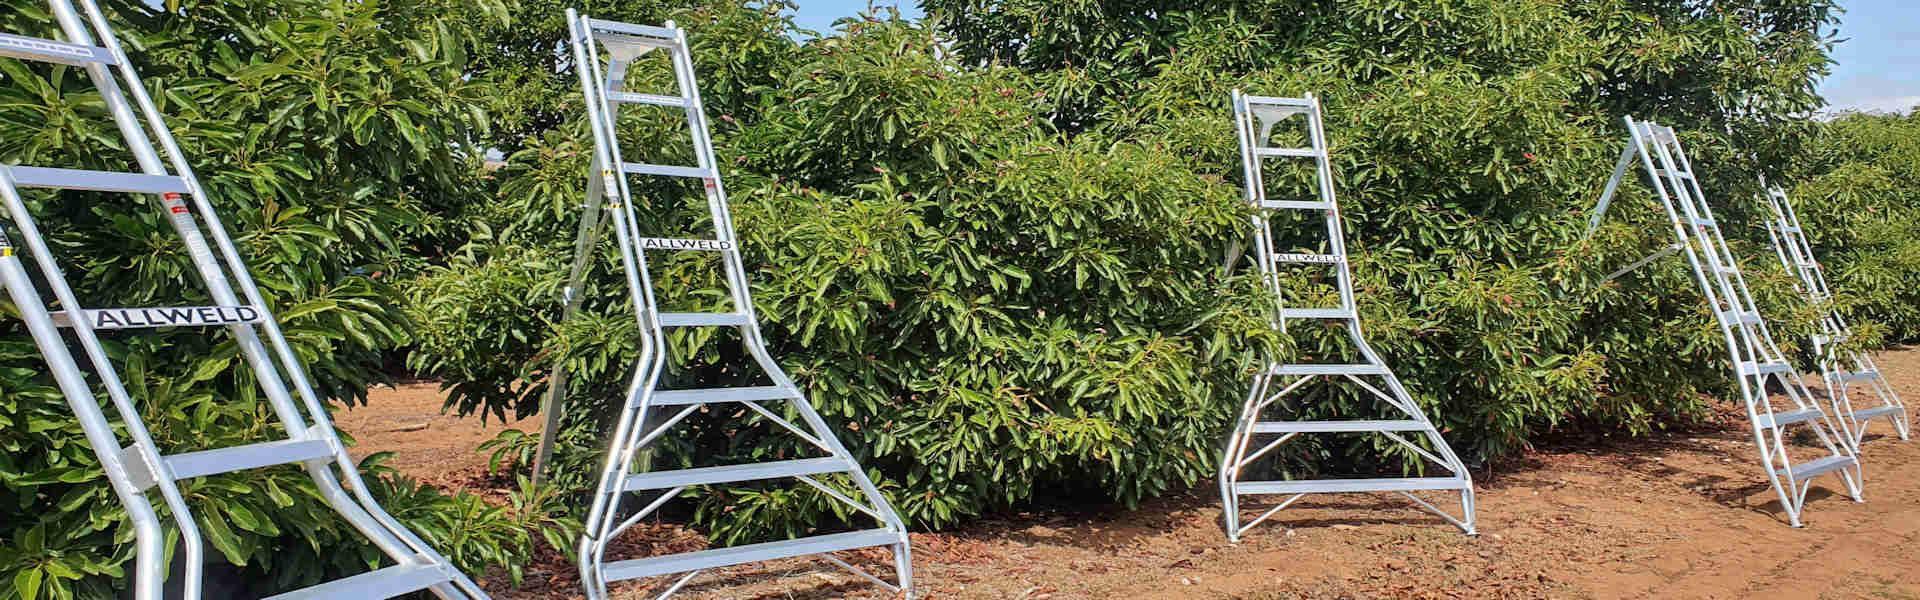 Allweld Orchard Ladders